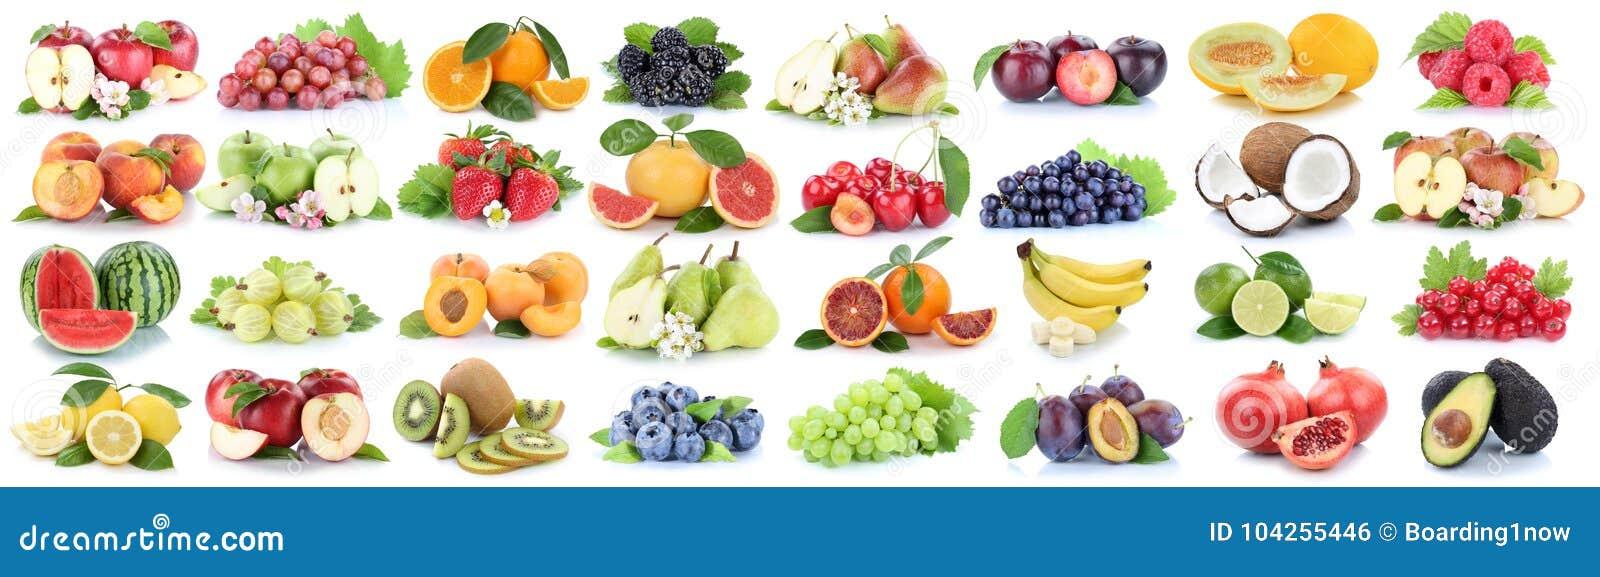 Fruits fruit collection fresh orange apple lemon berries isolate